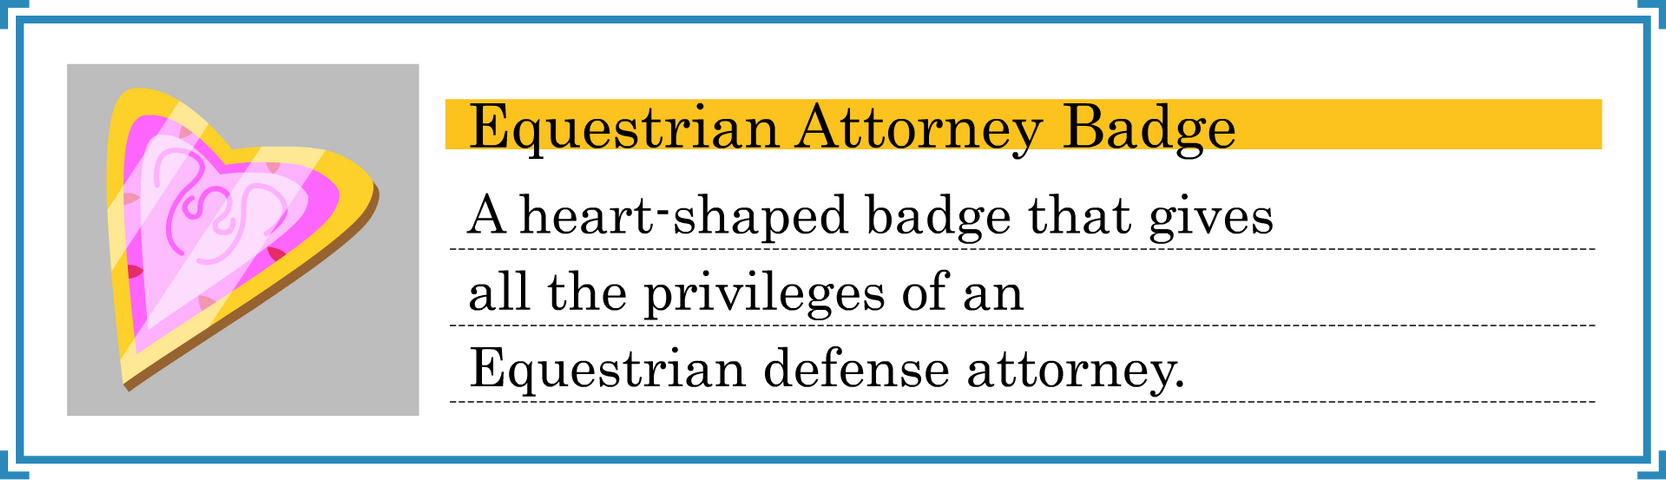 Equestrian Attorney Badge [Shaded]